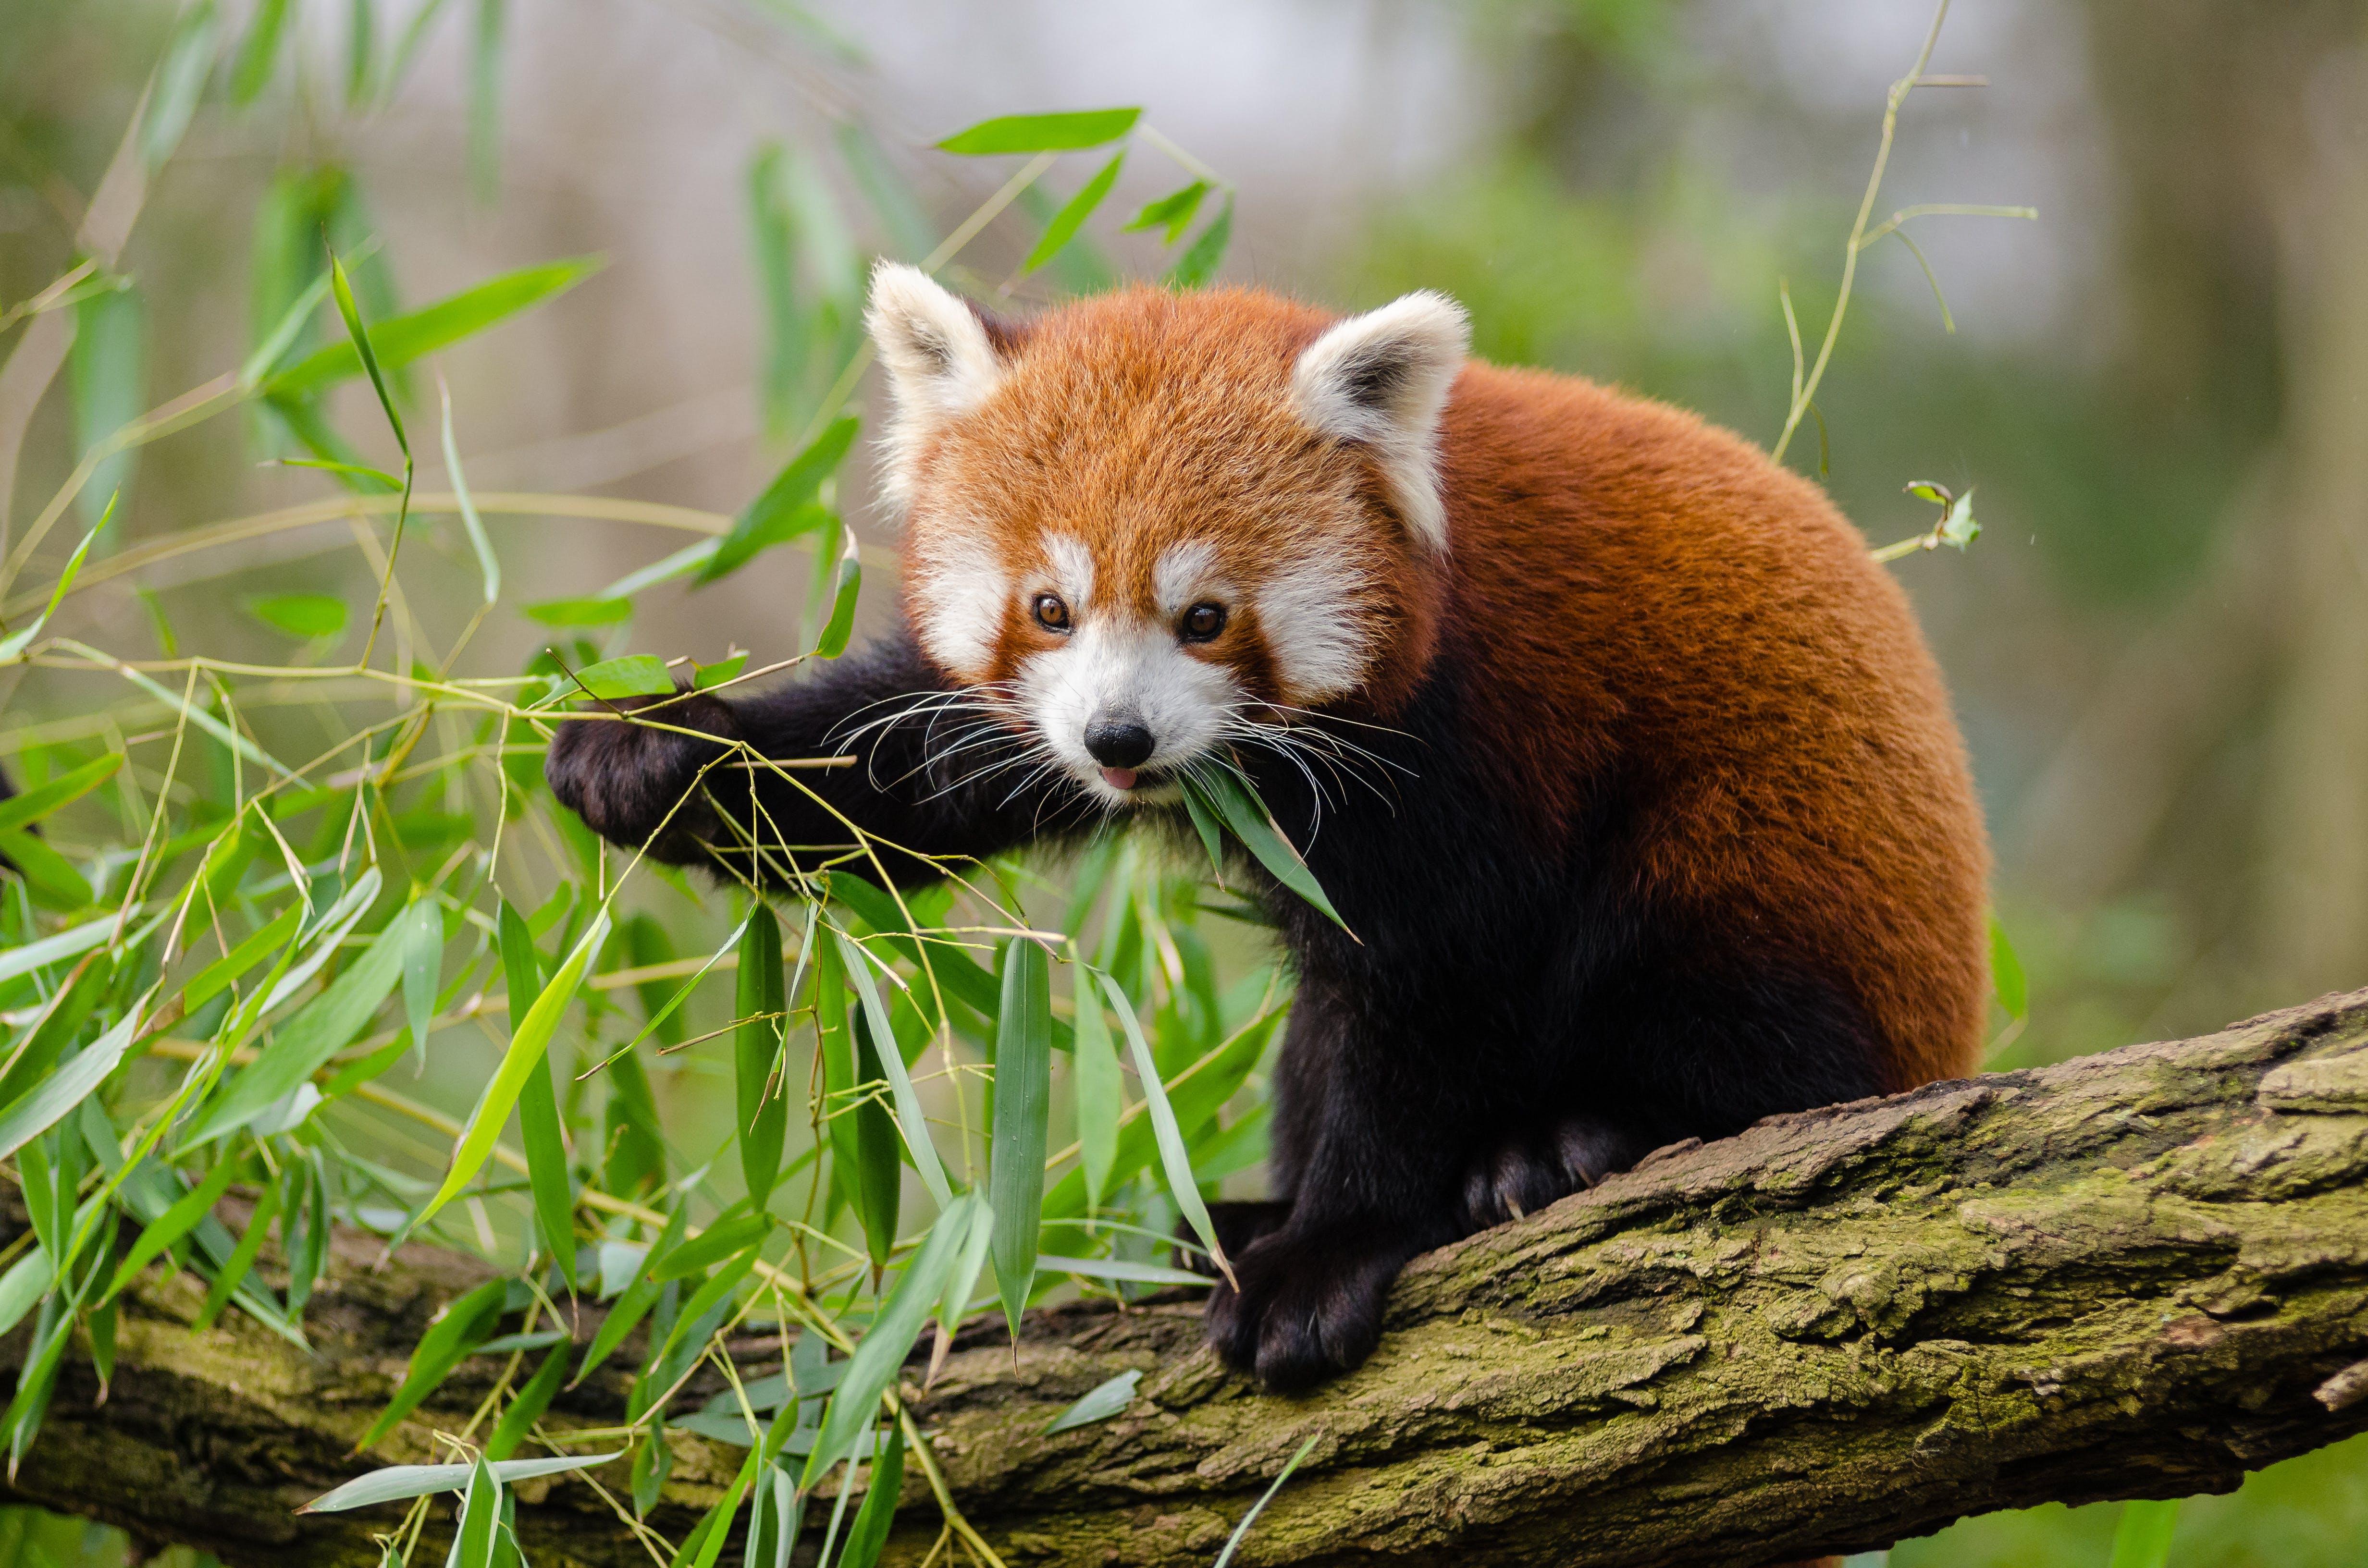 Red Panda Eating Green Leaf on Tree Branch during Daytime